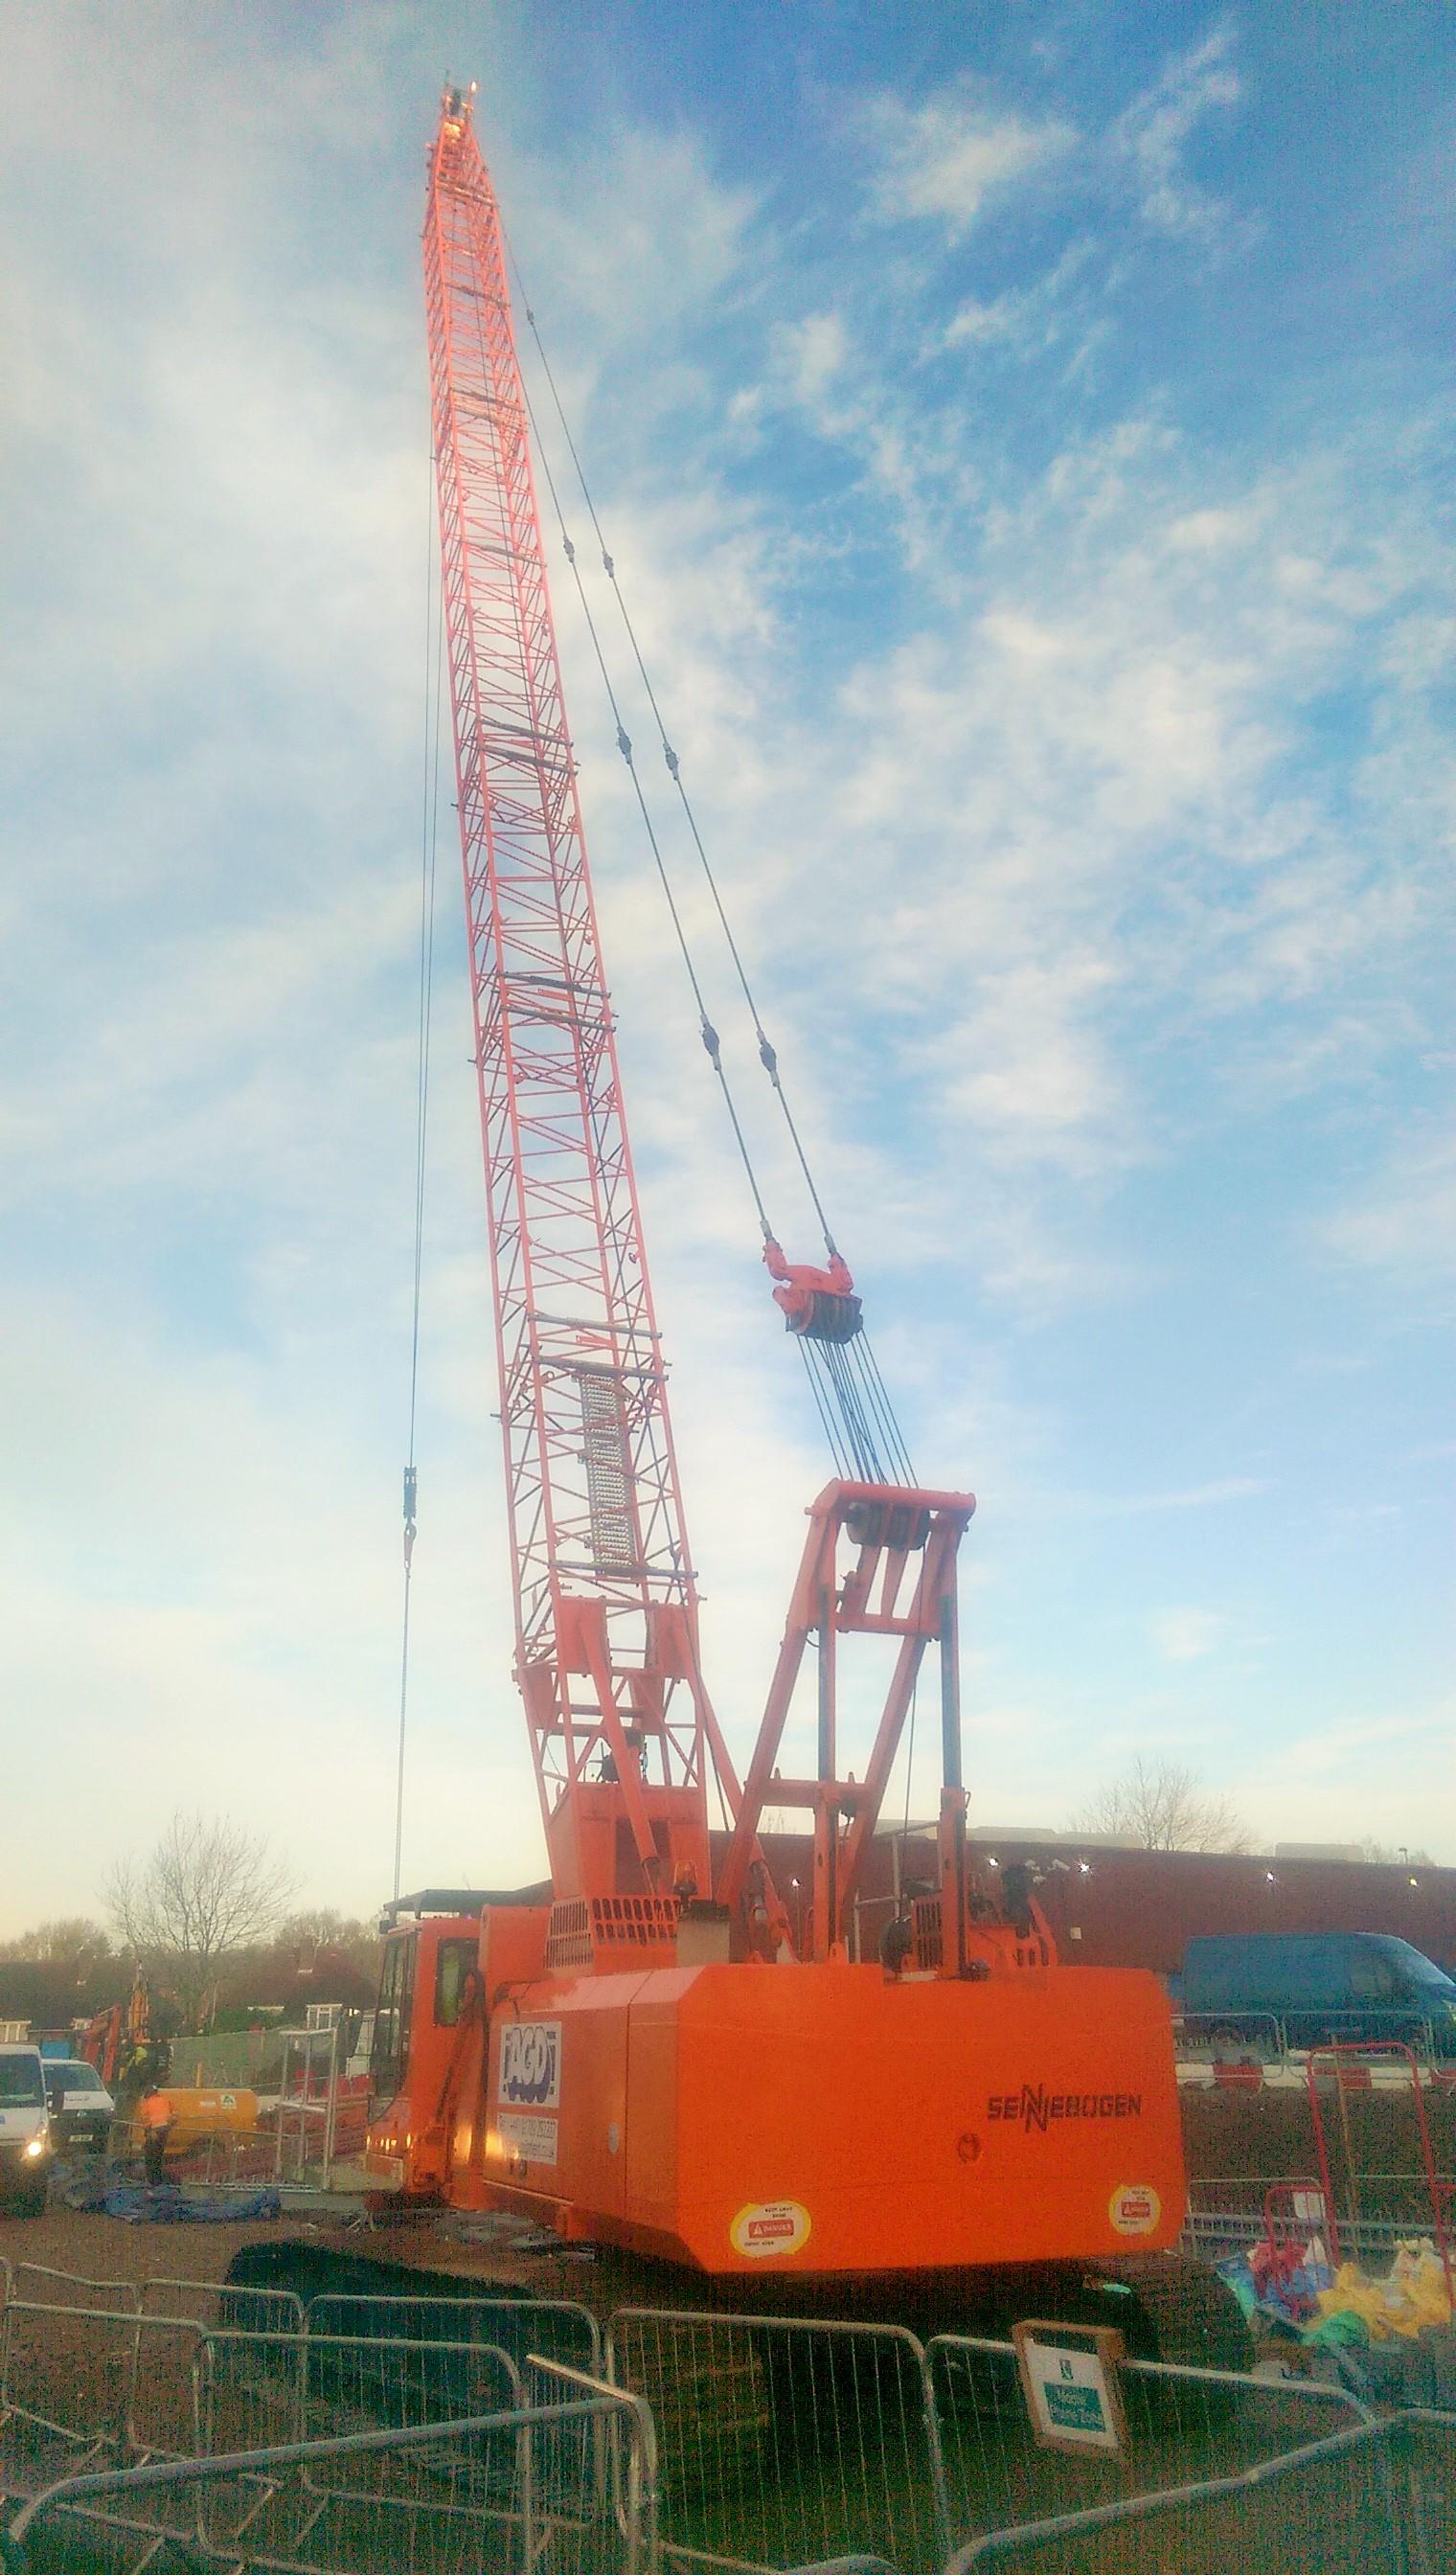 Sennebogen 650HD crawler crane on hire